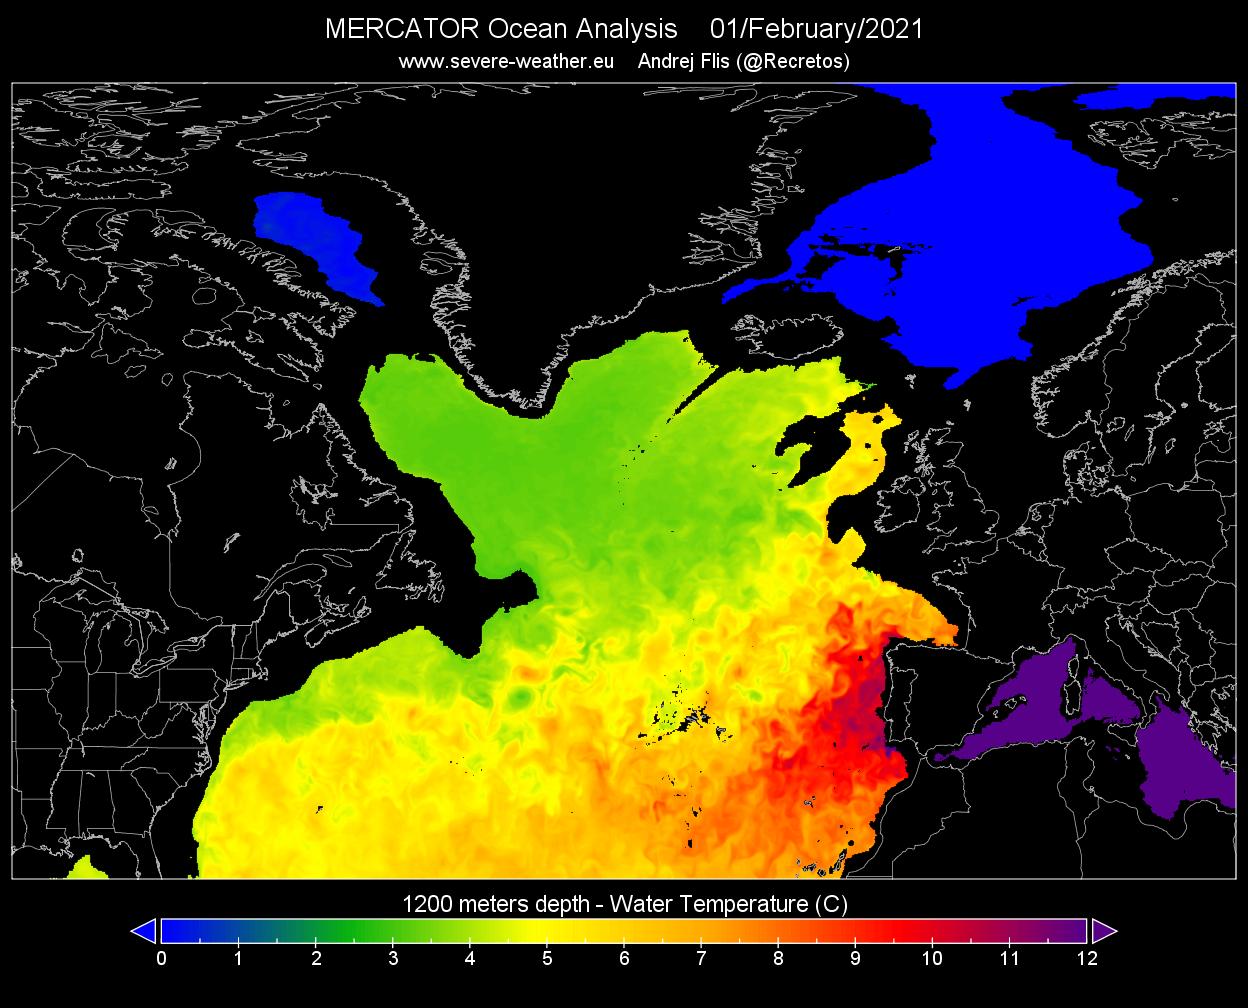 gulf-stream-ocean-1200-meters-depth-temperature-usa-europe